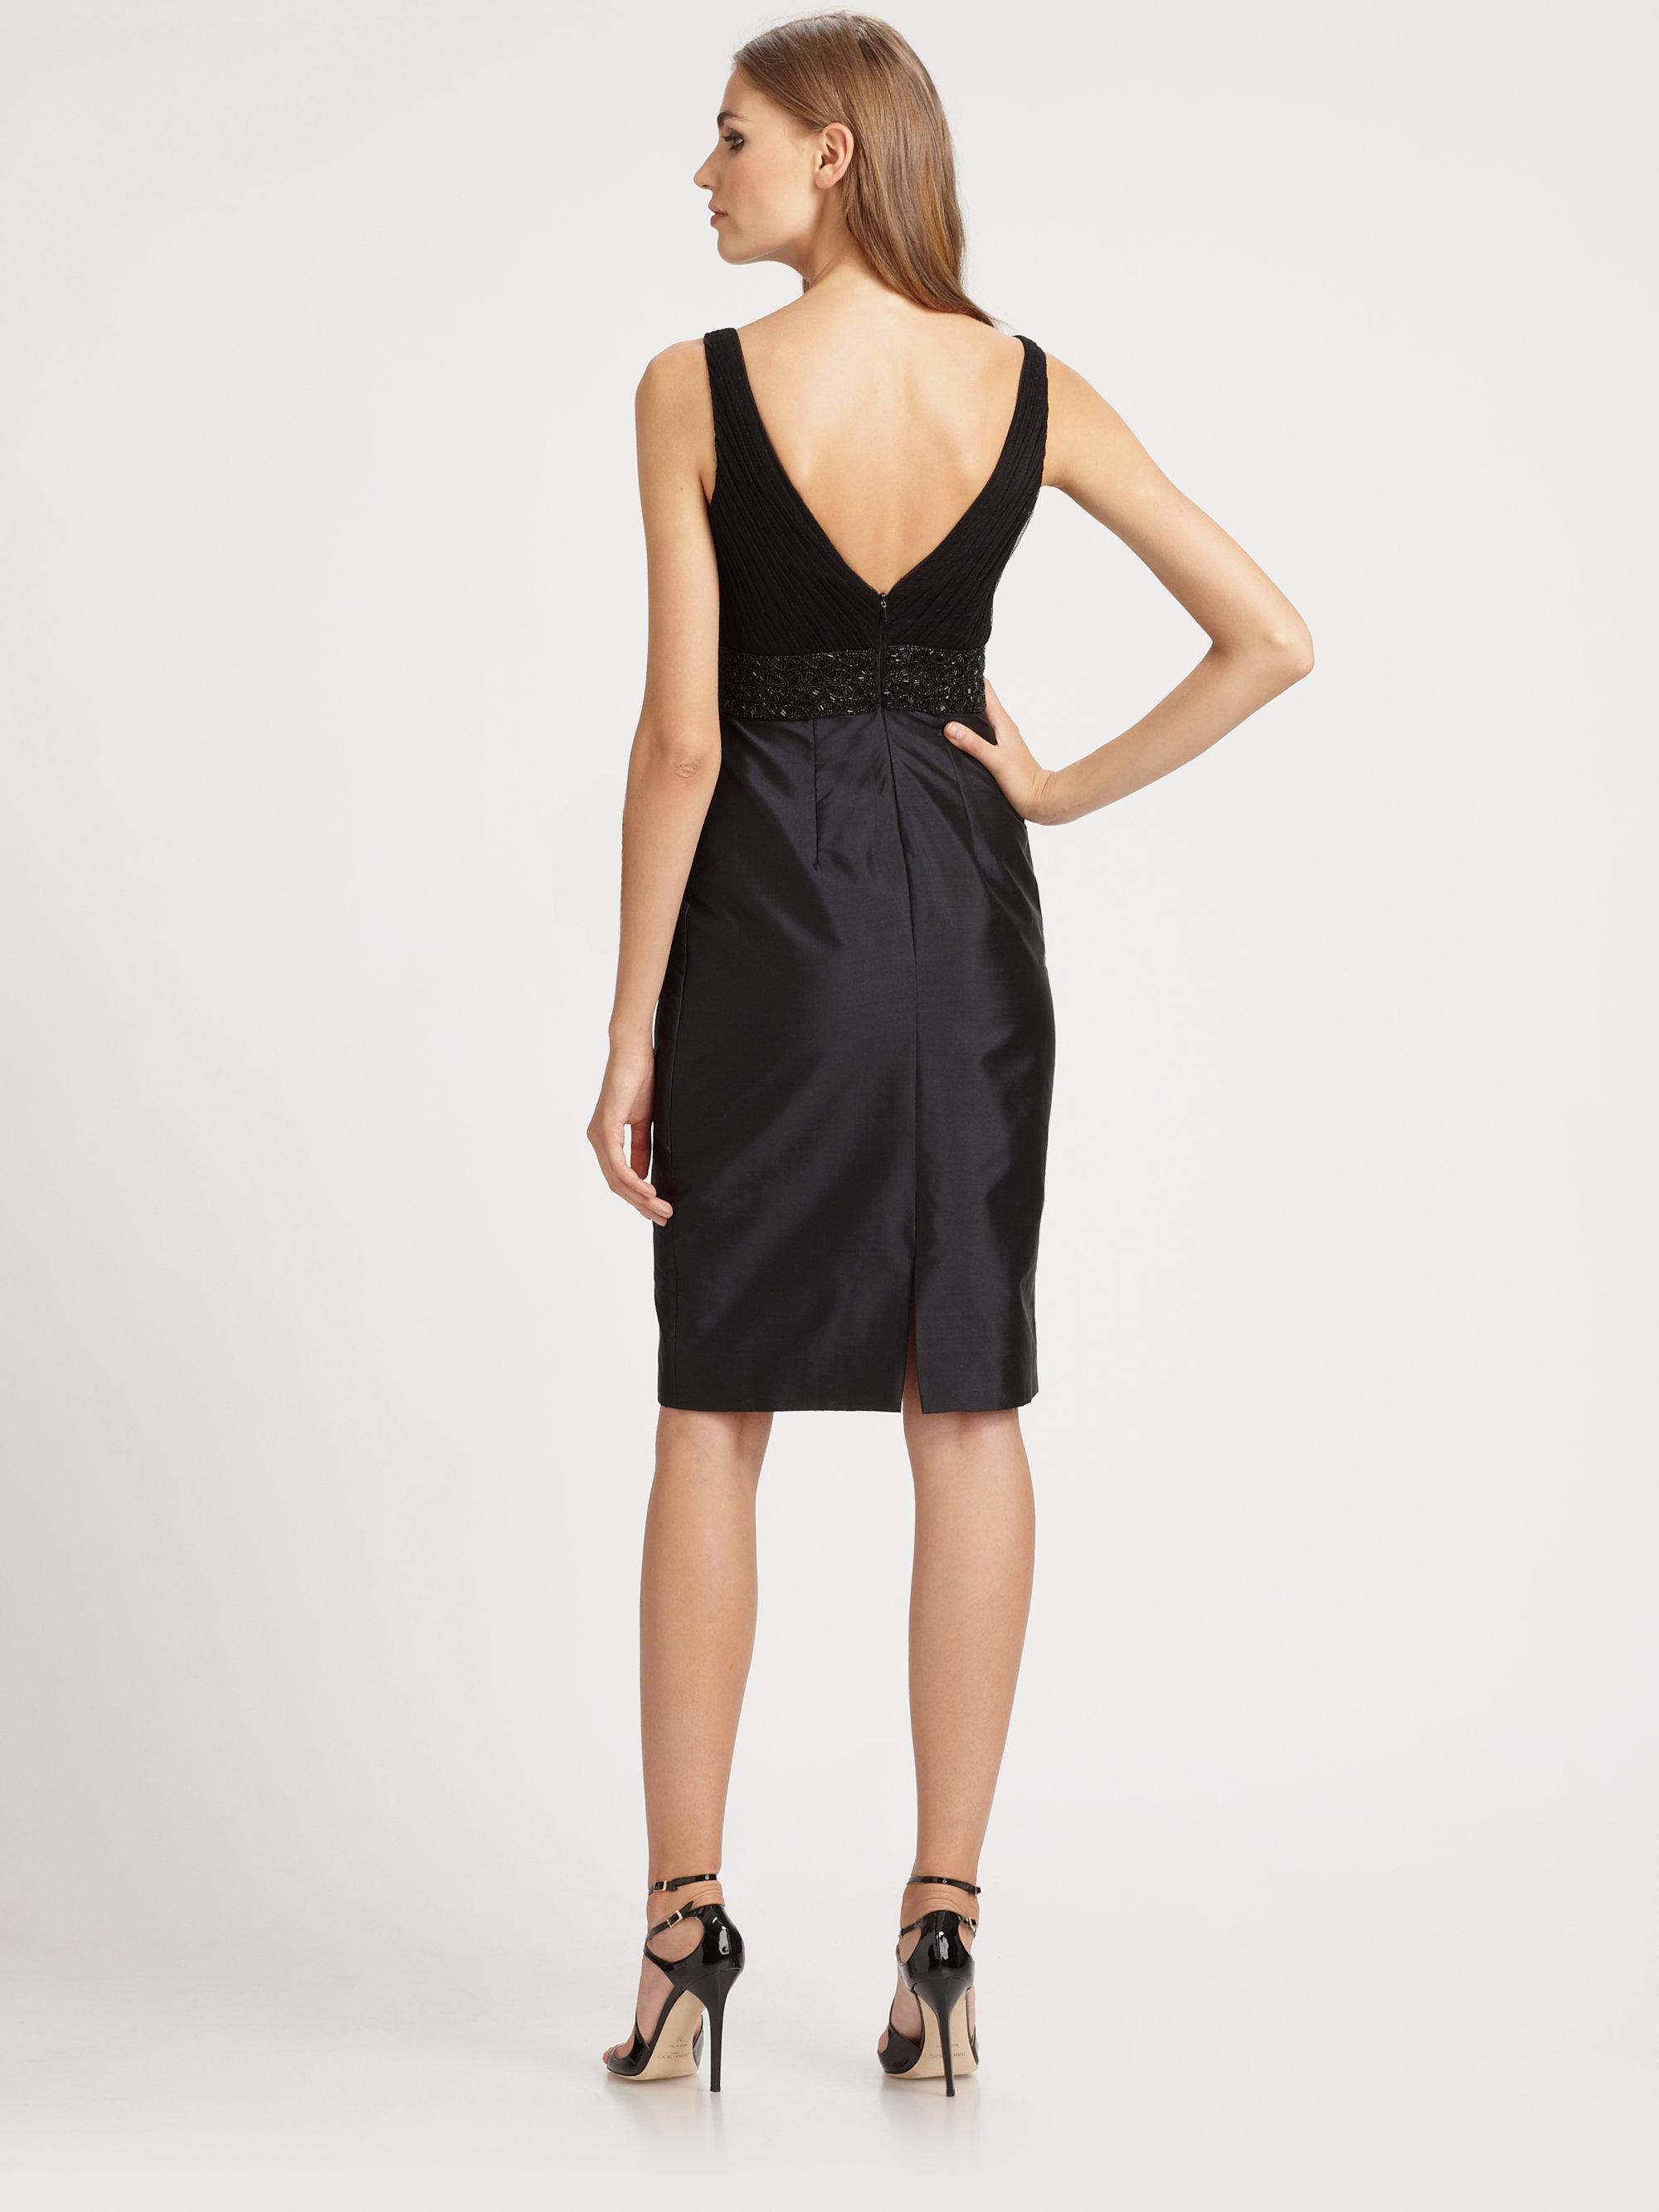 Ml monique lhuillier Beaded Taffeta Cocktail Dress in Black | Lyst